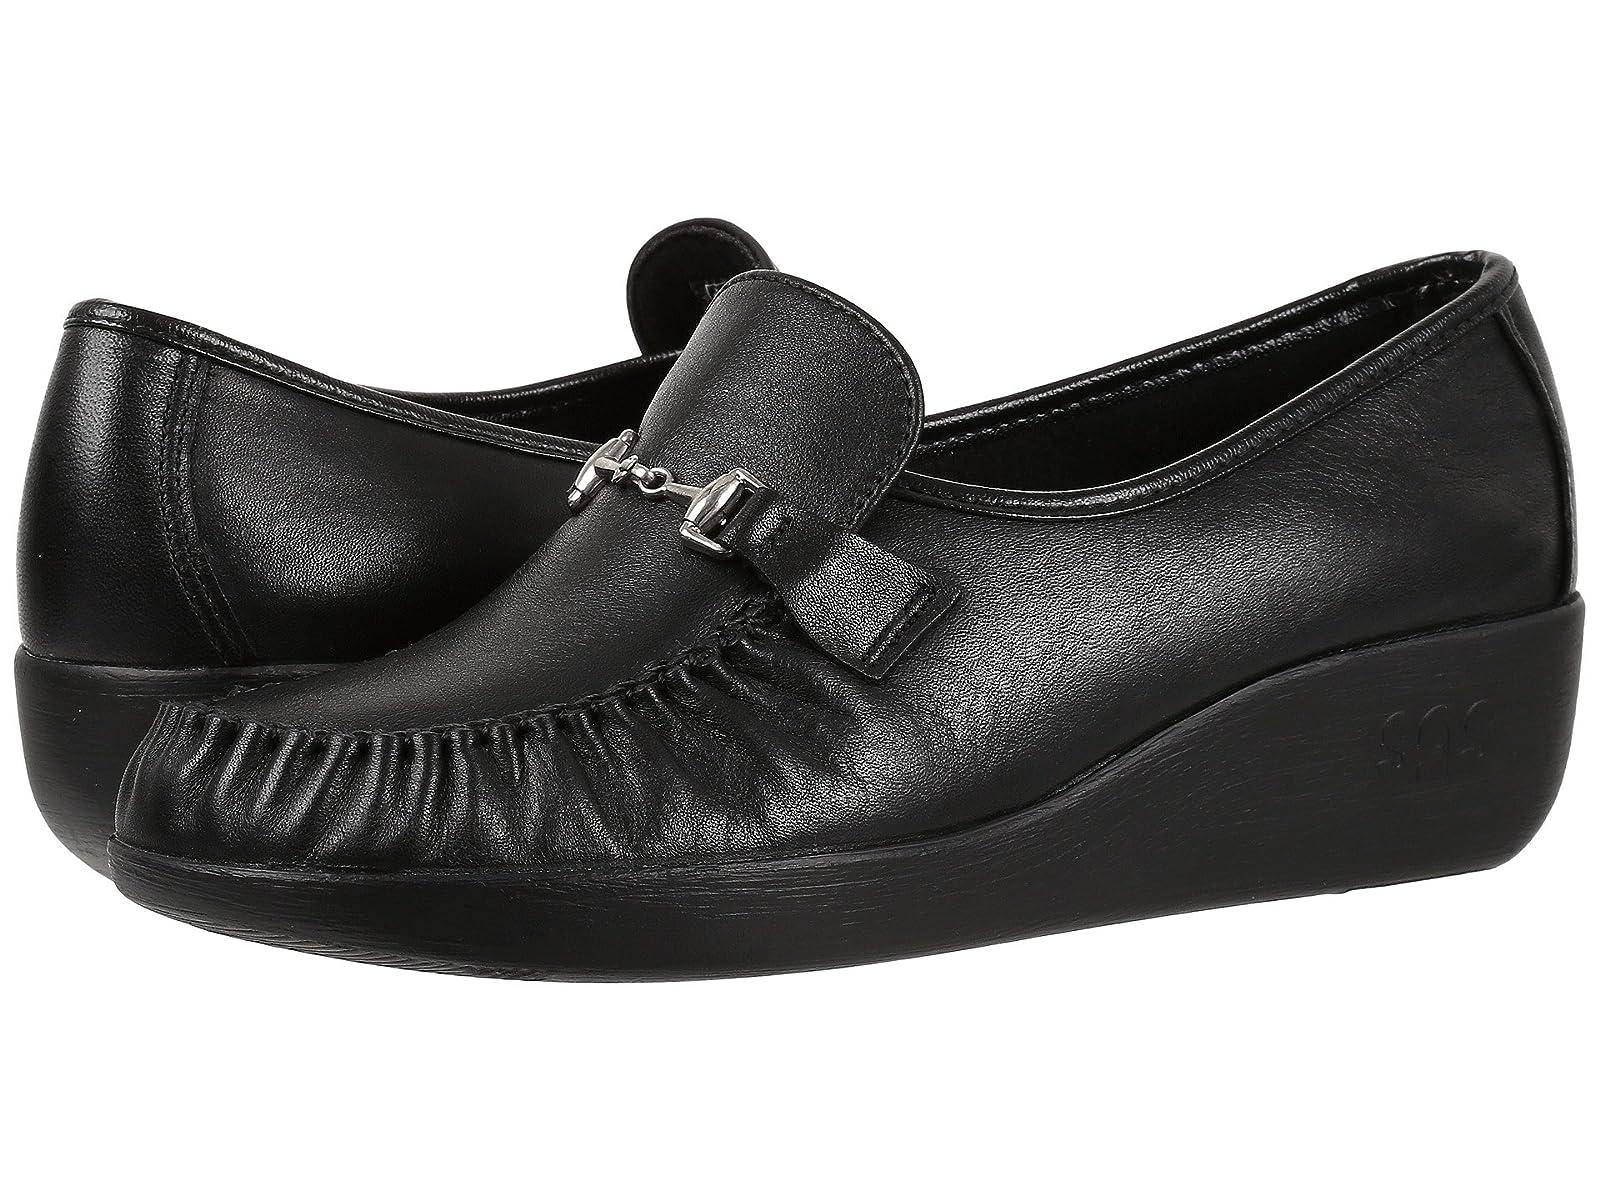 Gentleman/Lady Gentleman/Lady Gentleman/Lady SAS Magical   Fashion versatile shoes bb62f4